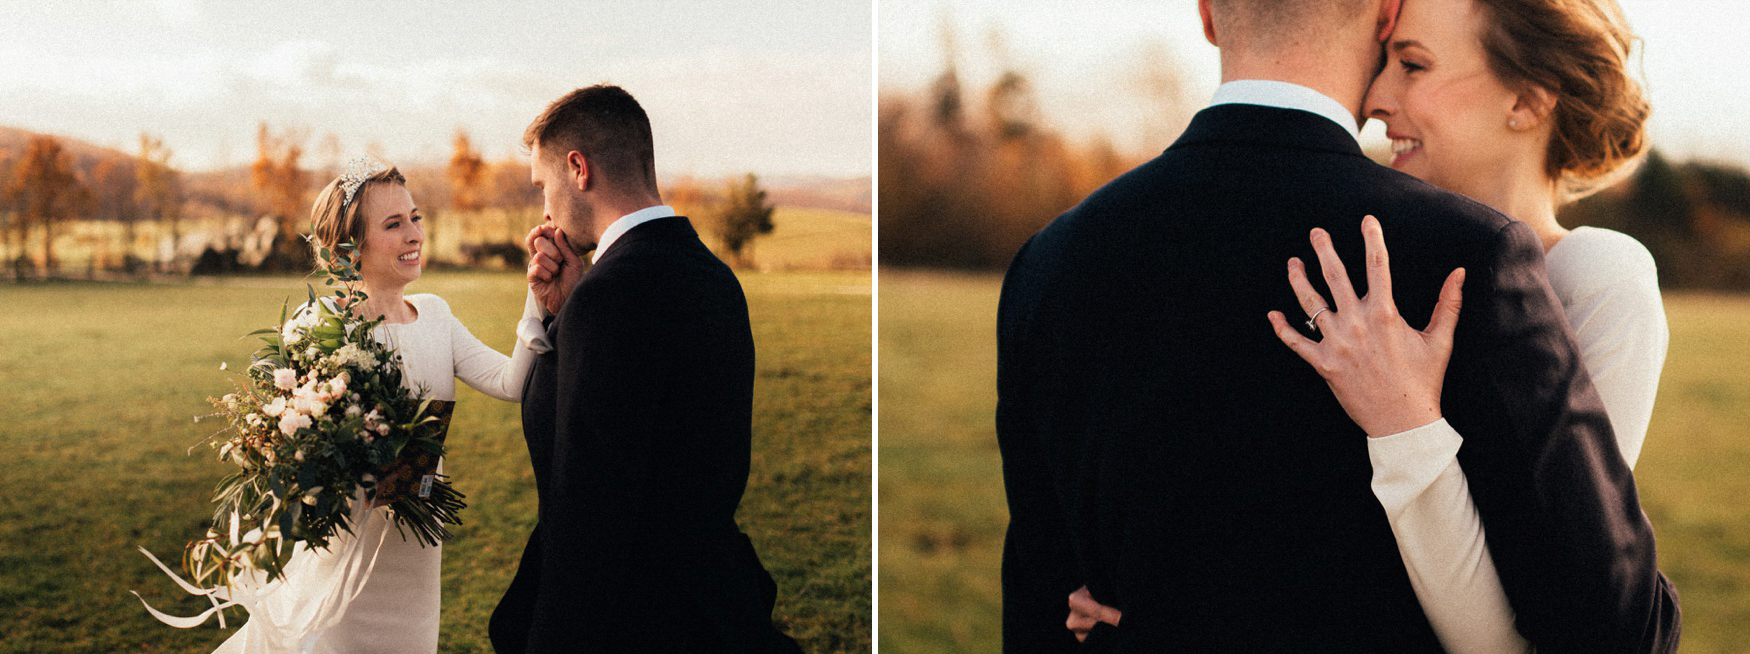 1 czech rustic wedding - svatba zikmundov036.jpg